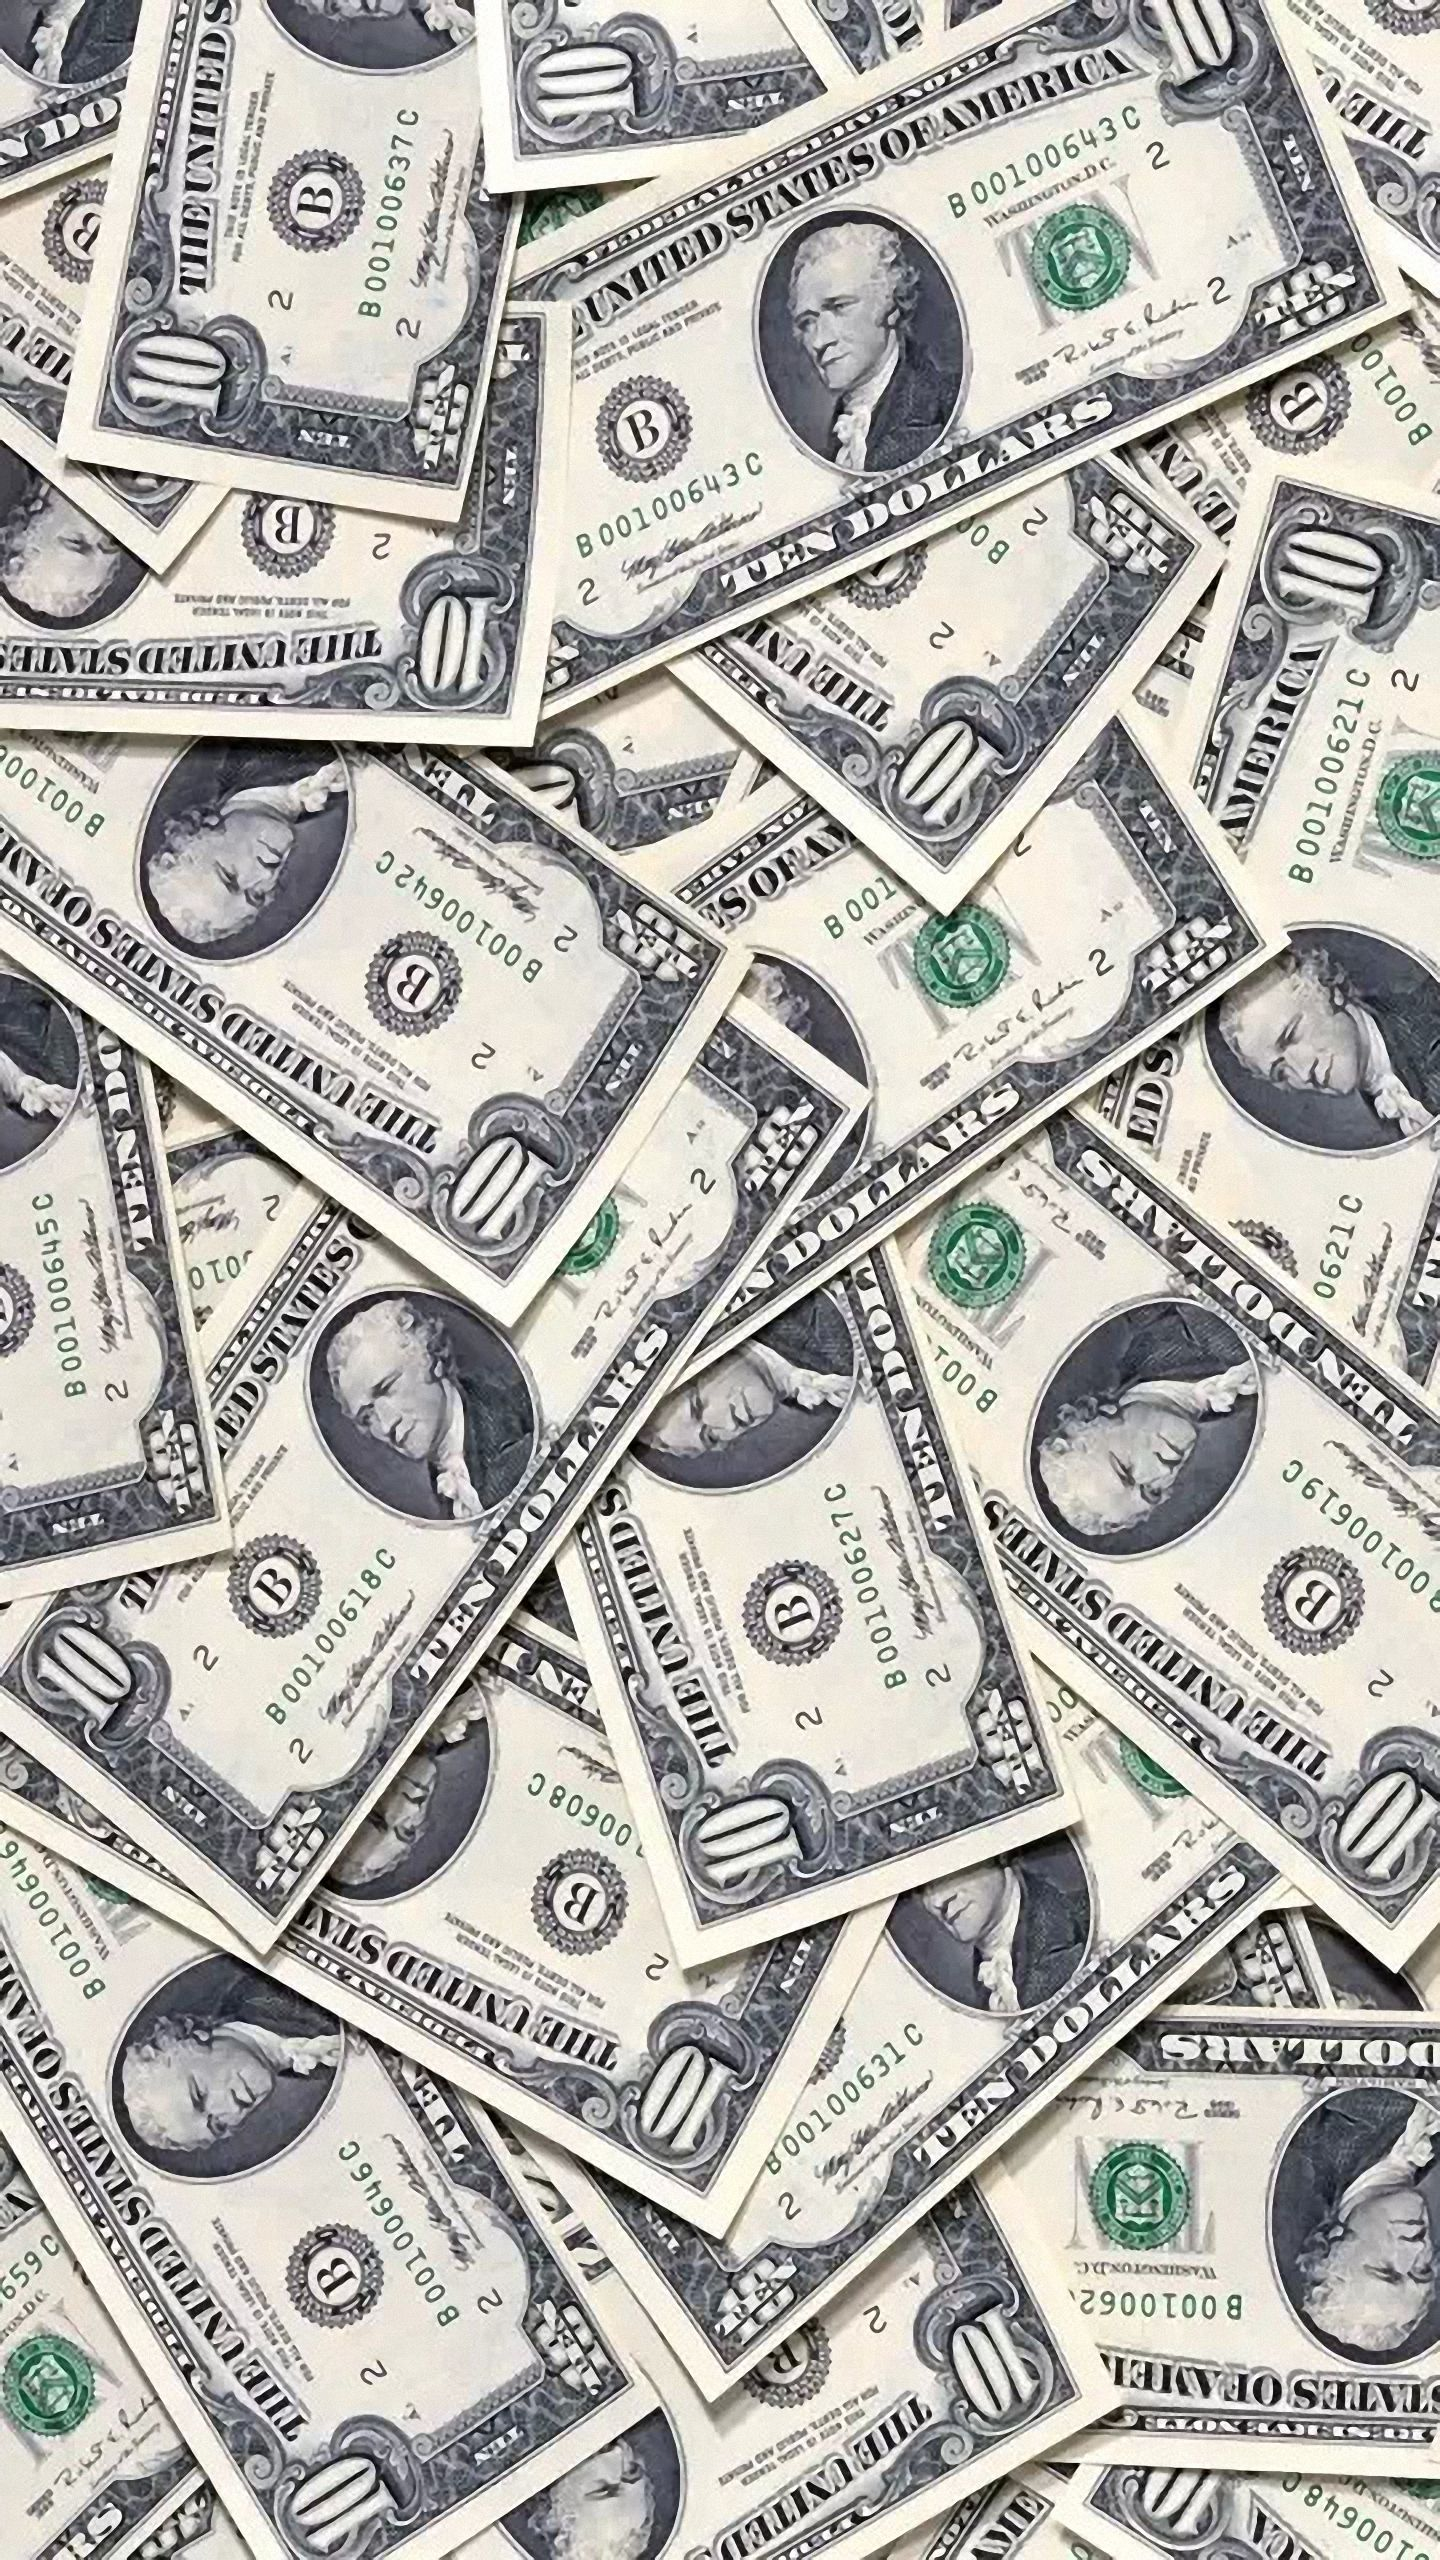 Alexander Hamilton is created the National Bank